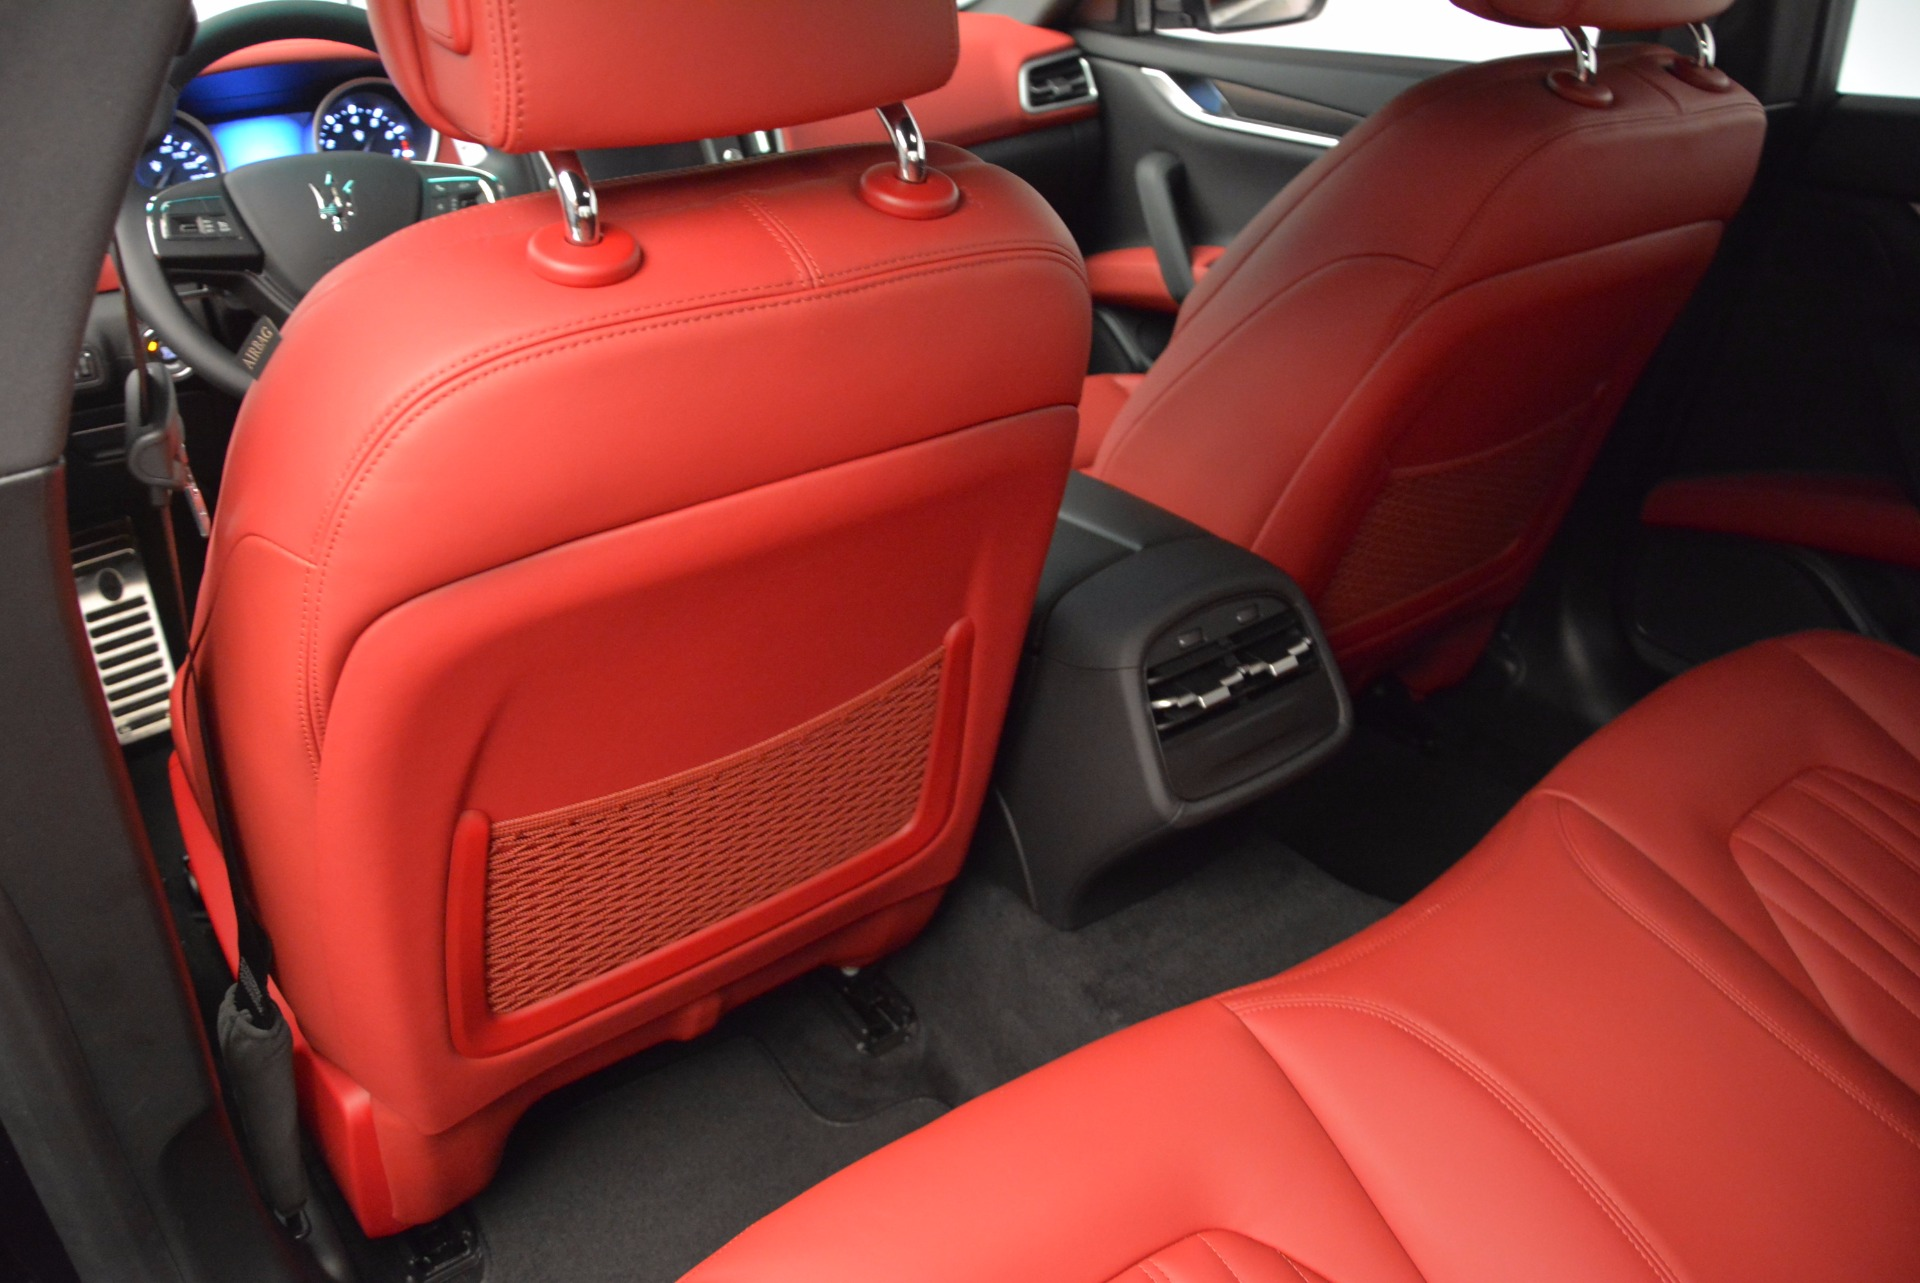 Used 2014 Maserati Ghibli S Q4 For Sale In Greenwich, CT 1459_p17